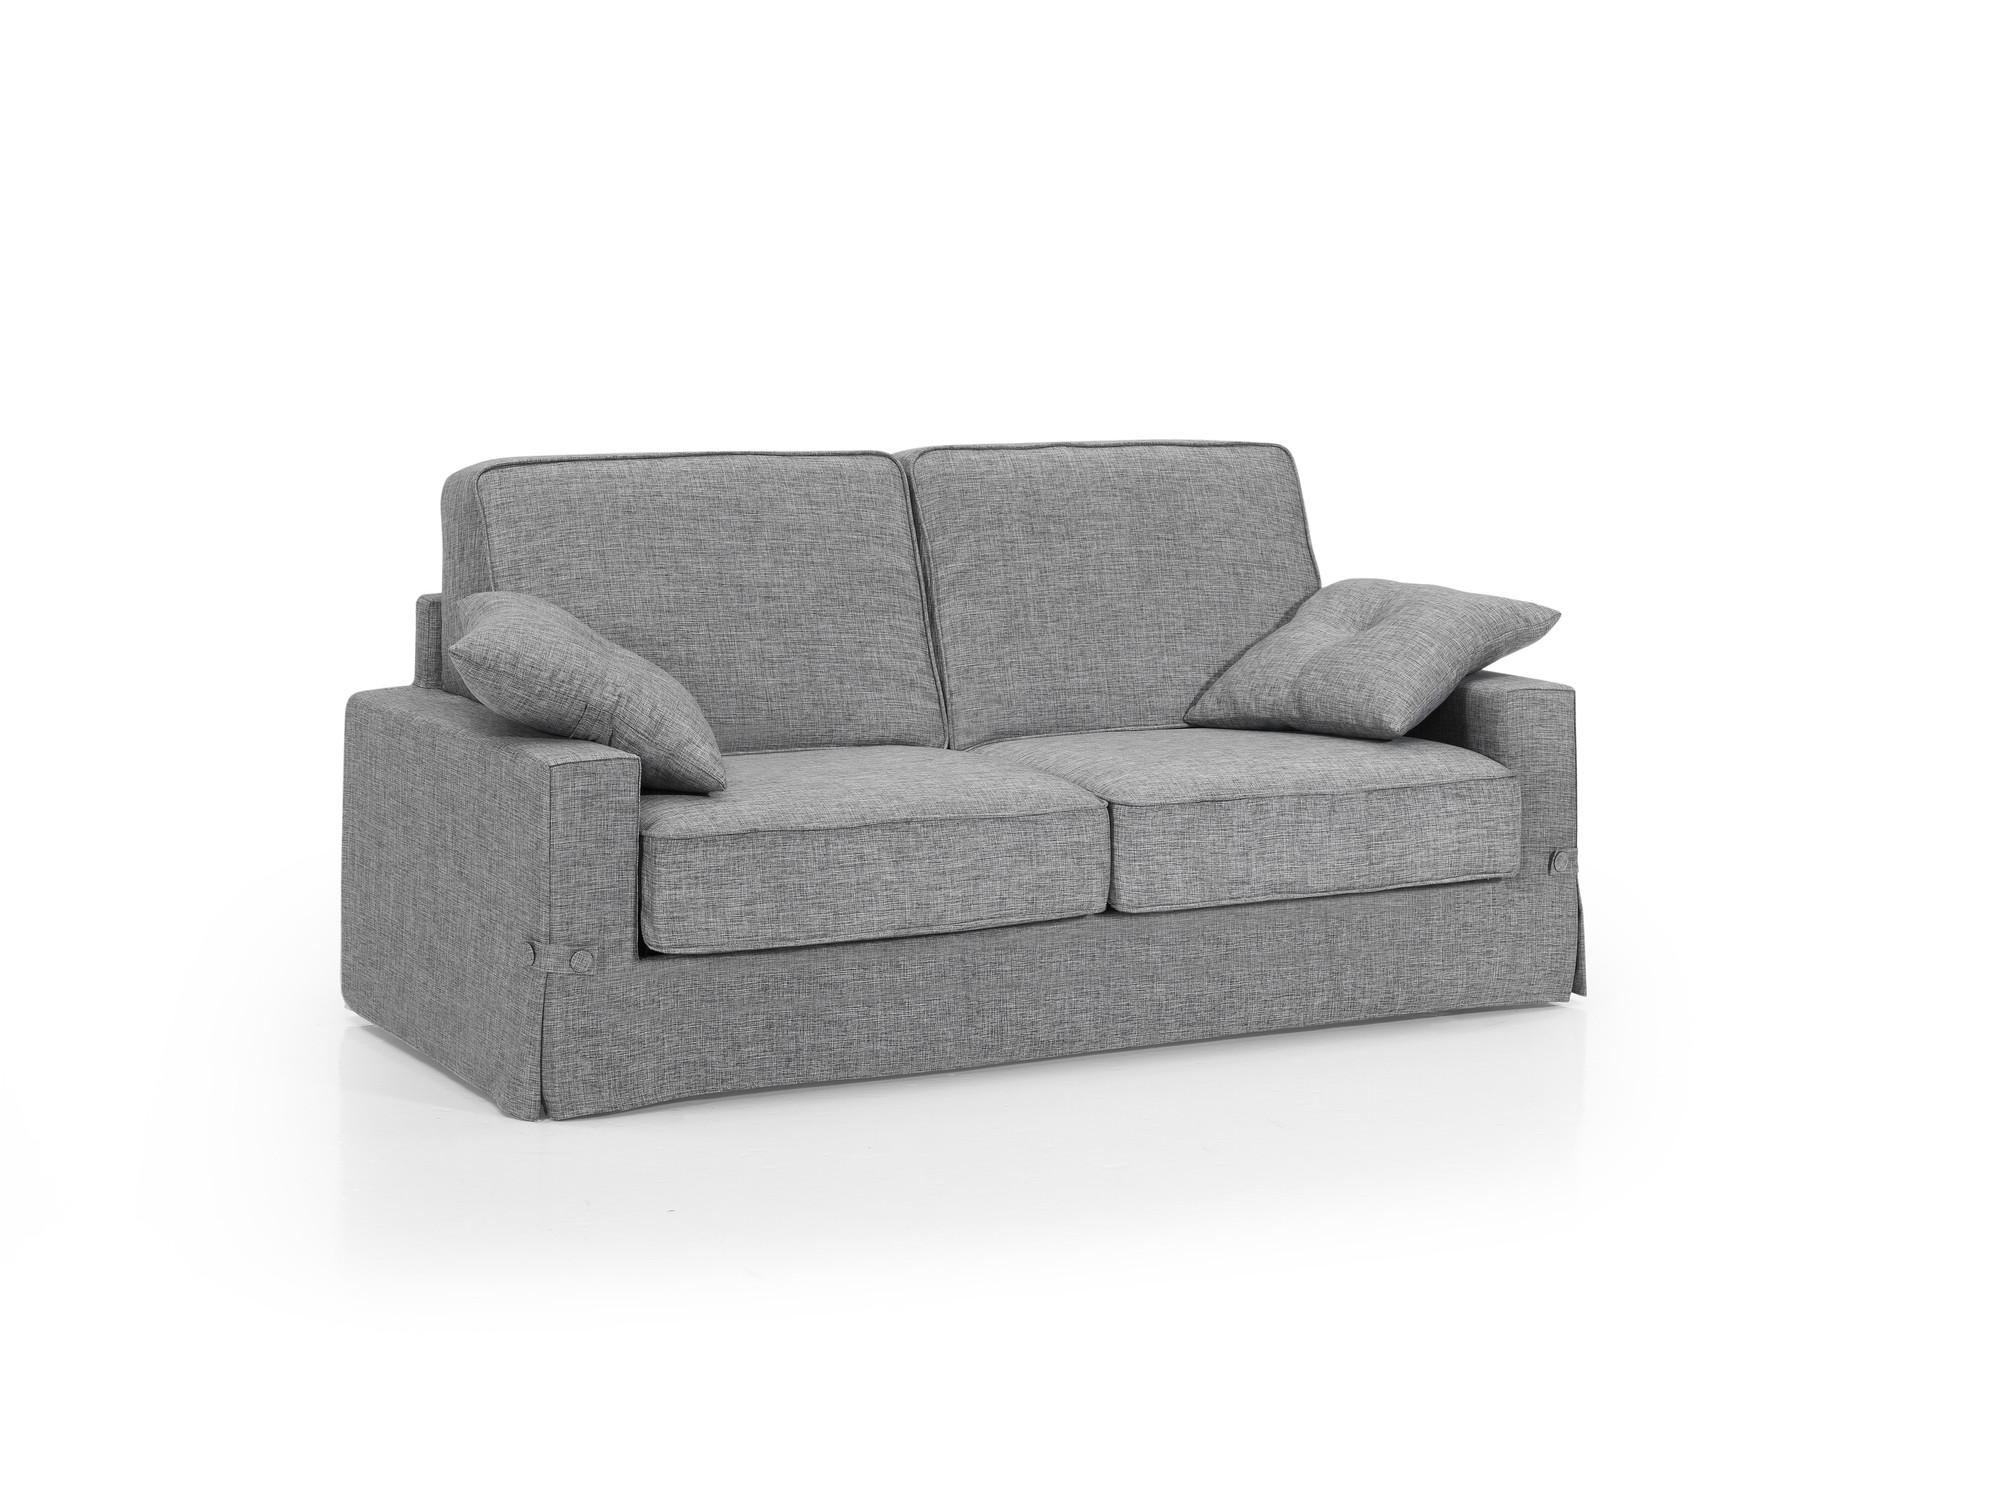 Comprar sofas cama baratos online la mesa de centro for Sofa cama 1 plaza barato